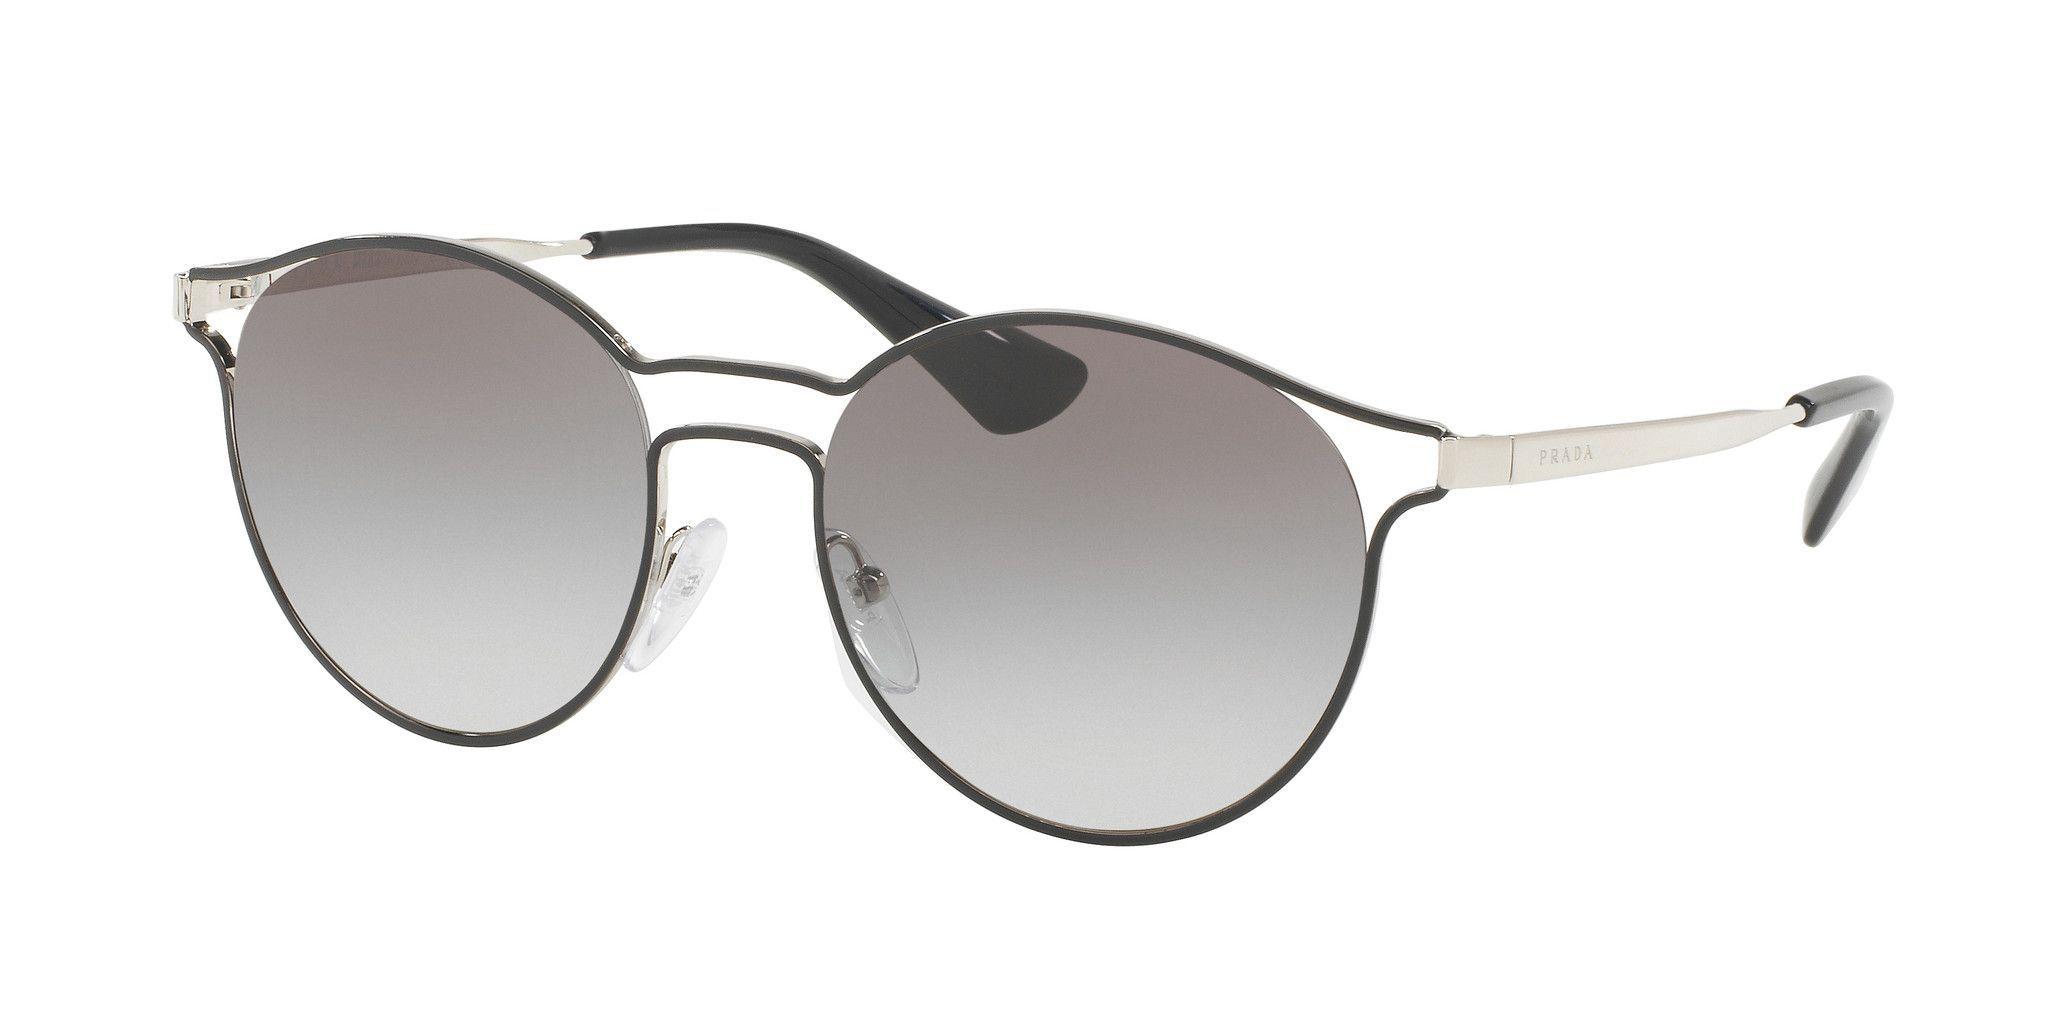 PRADA Prada Damen Sonnenbrille »CINEMA PR 62SS«, schwarz, 1AB0A7 - schwarz/grau